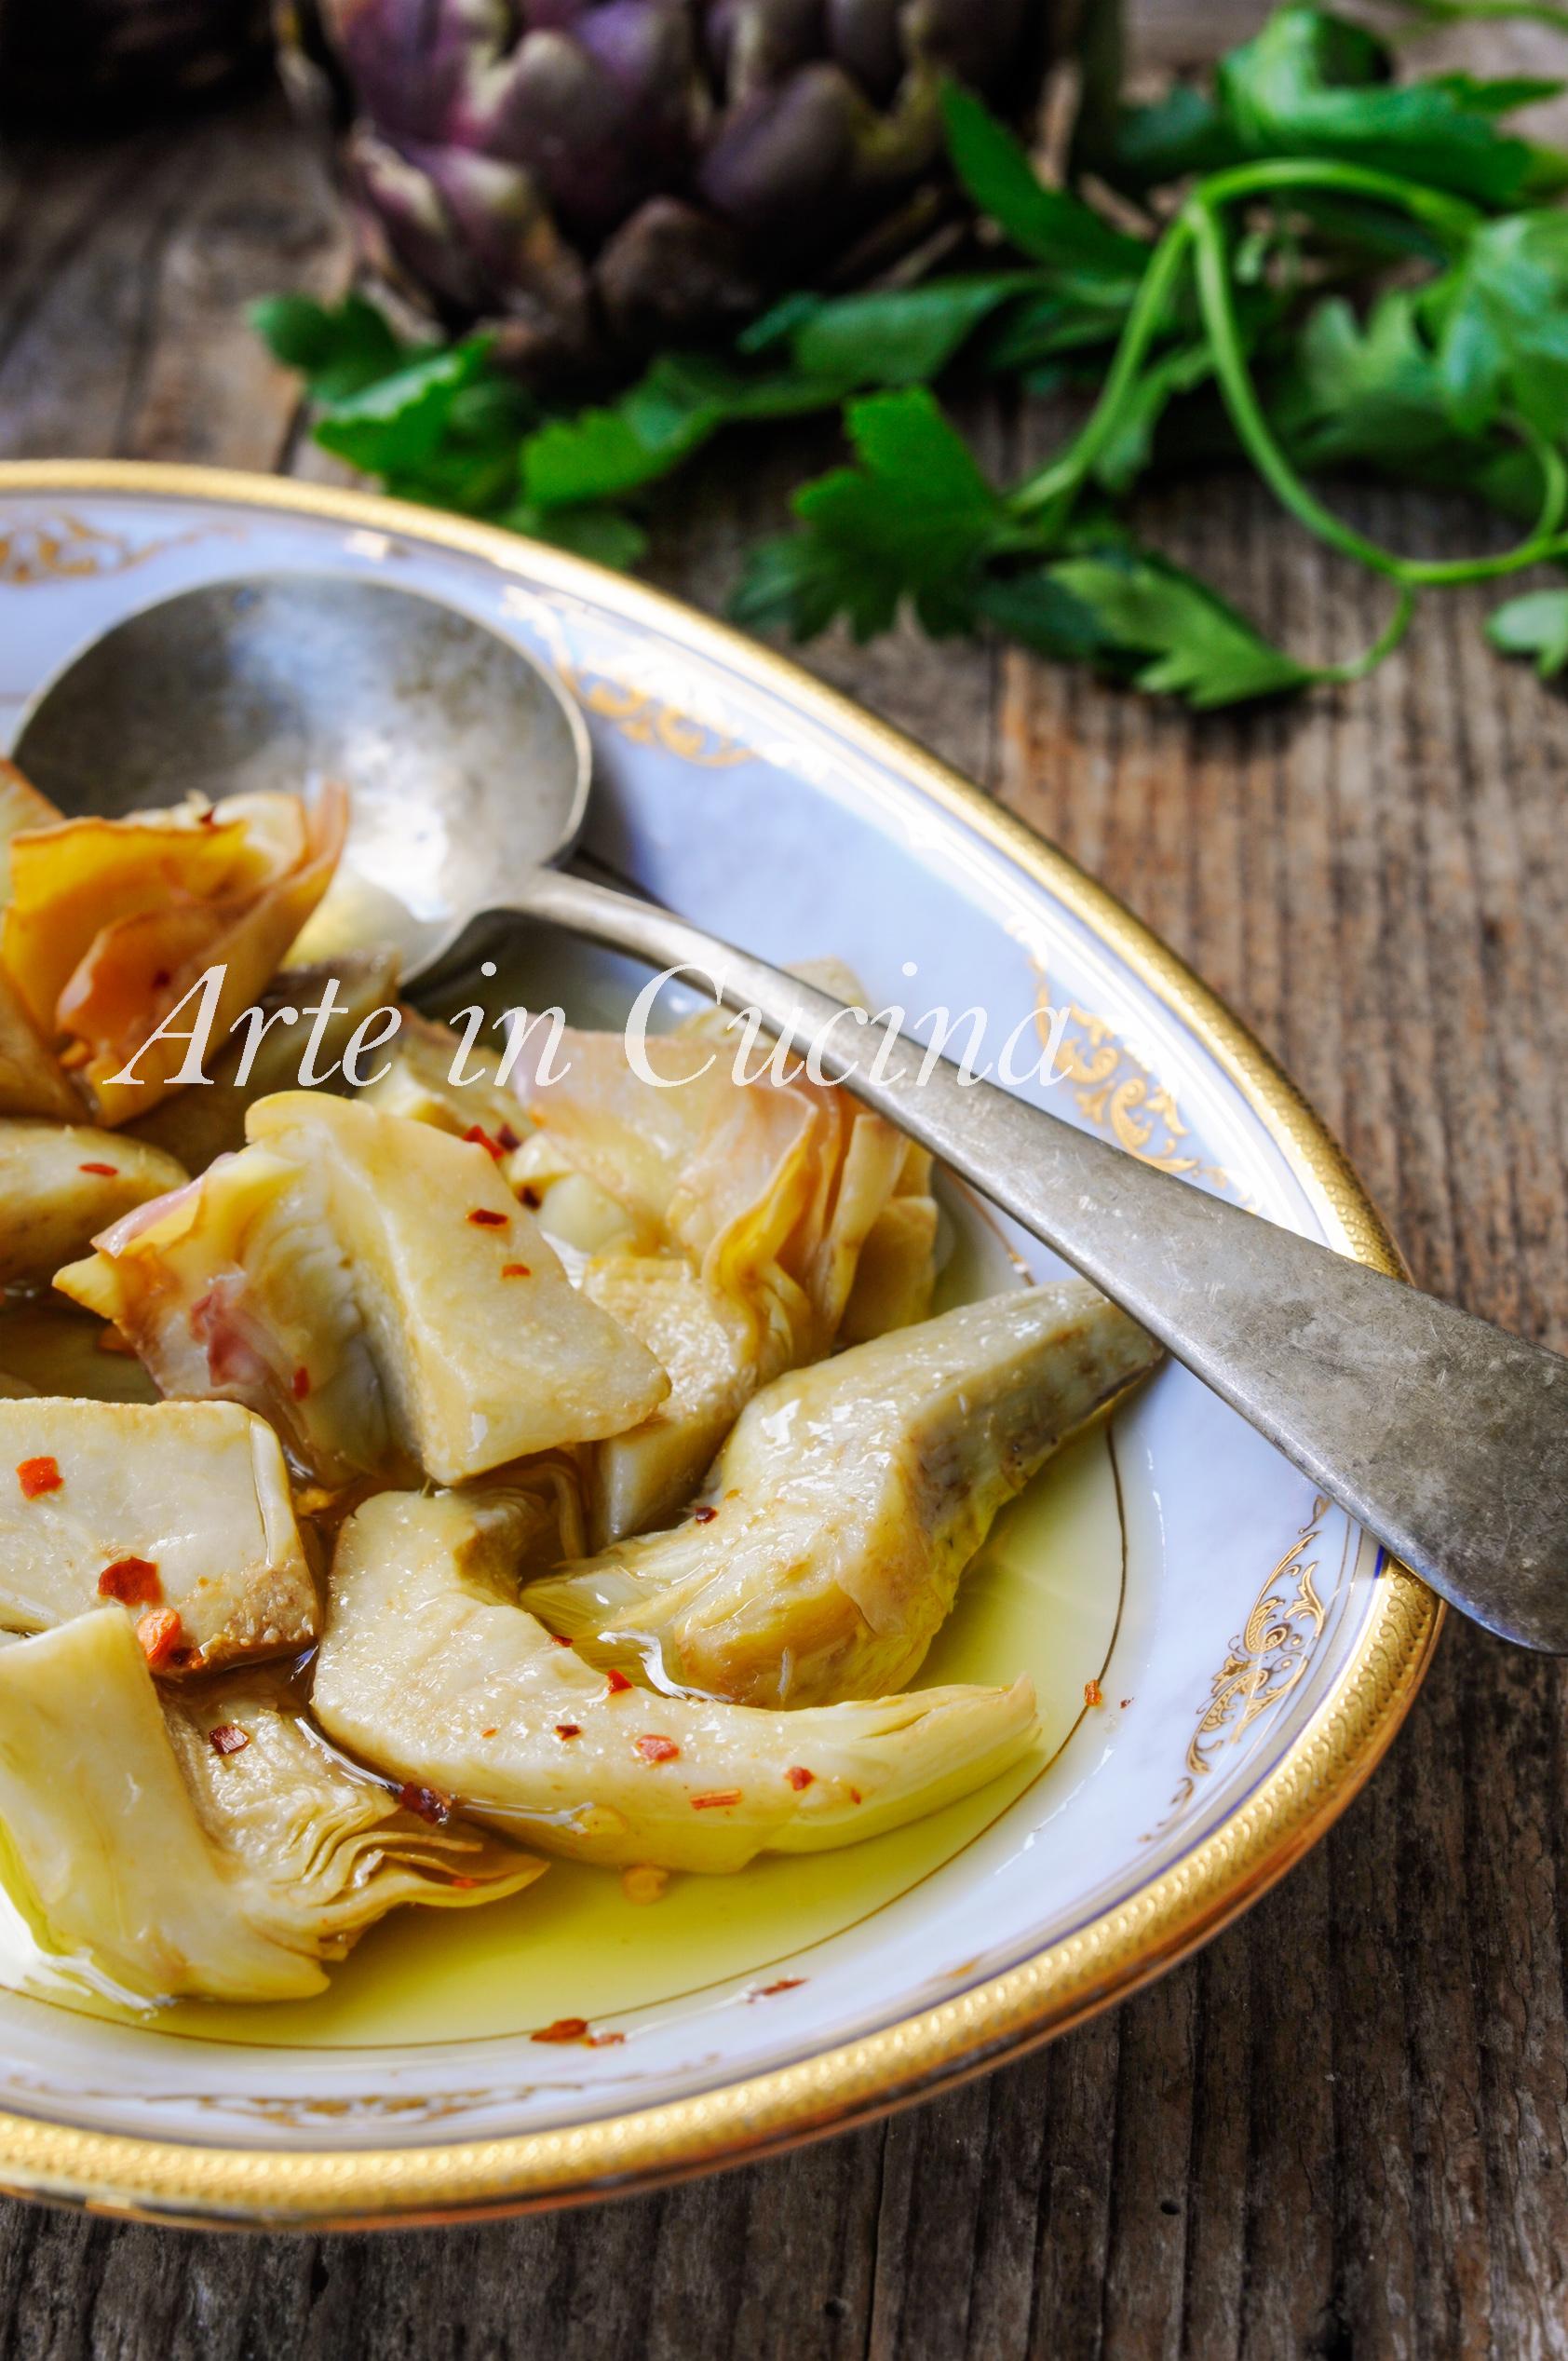 Carciofini sott'olio ricetta antipasto facile vickyart arte in cucina